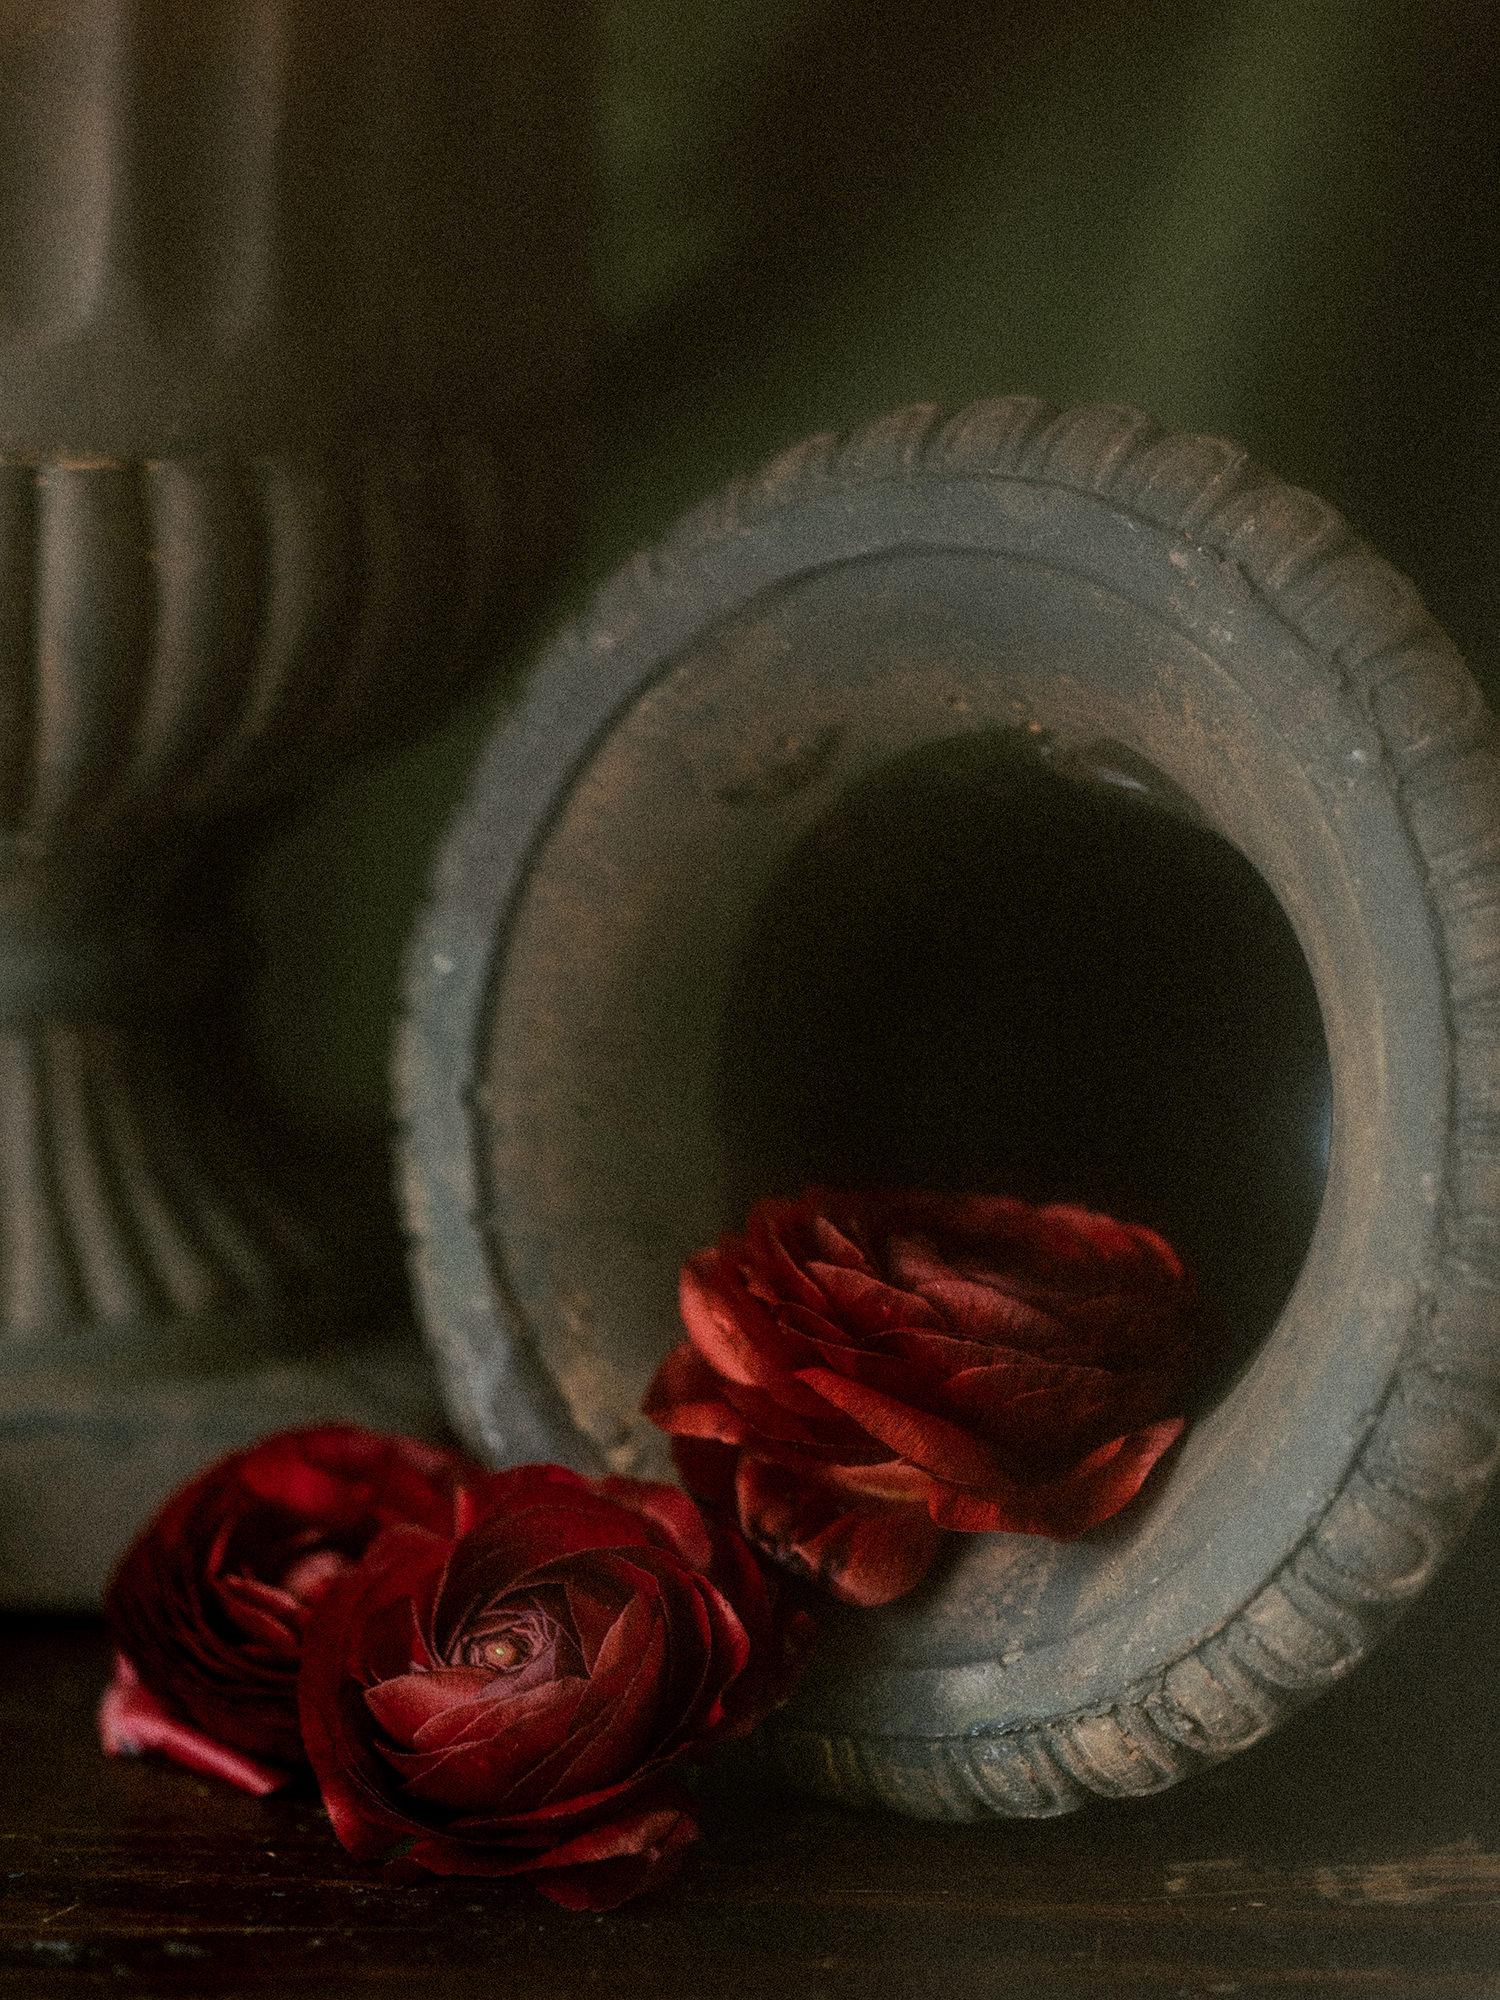 Dramatic detail of a wedding flower centerpiece.